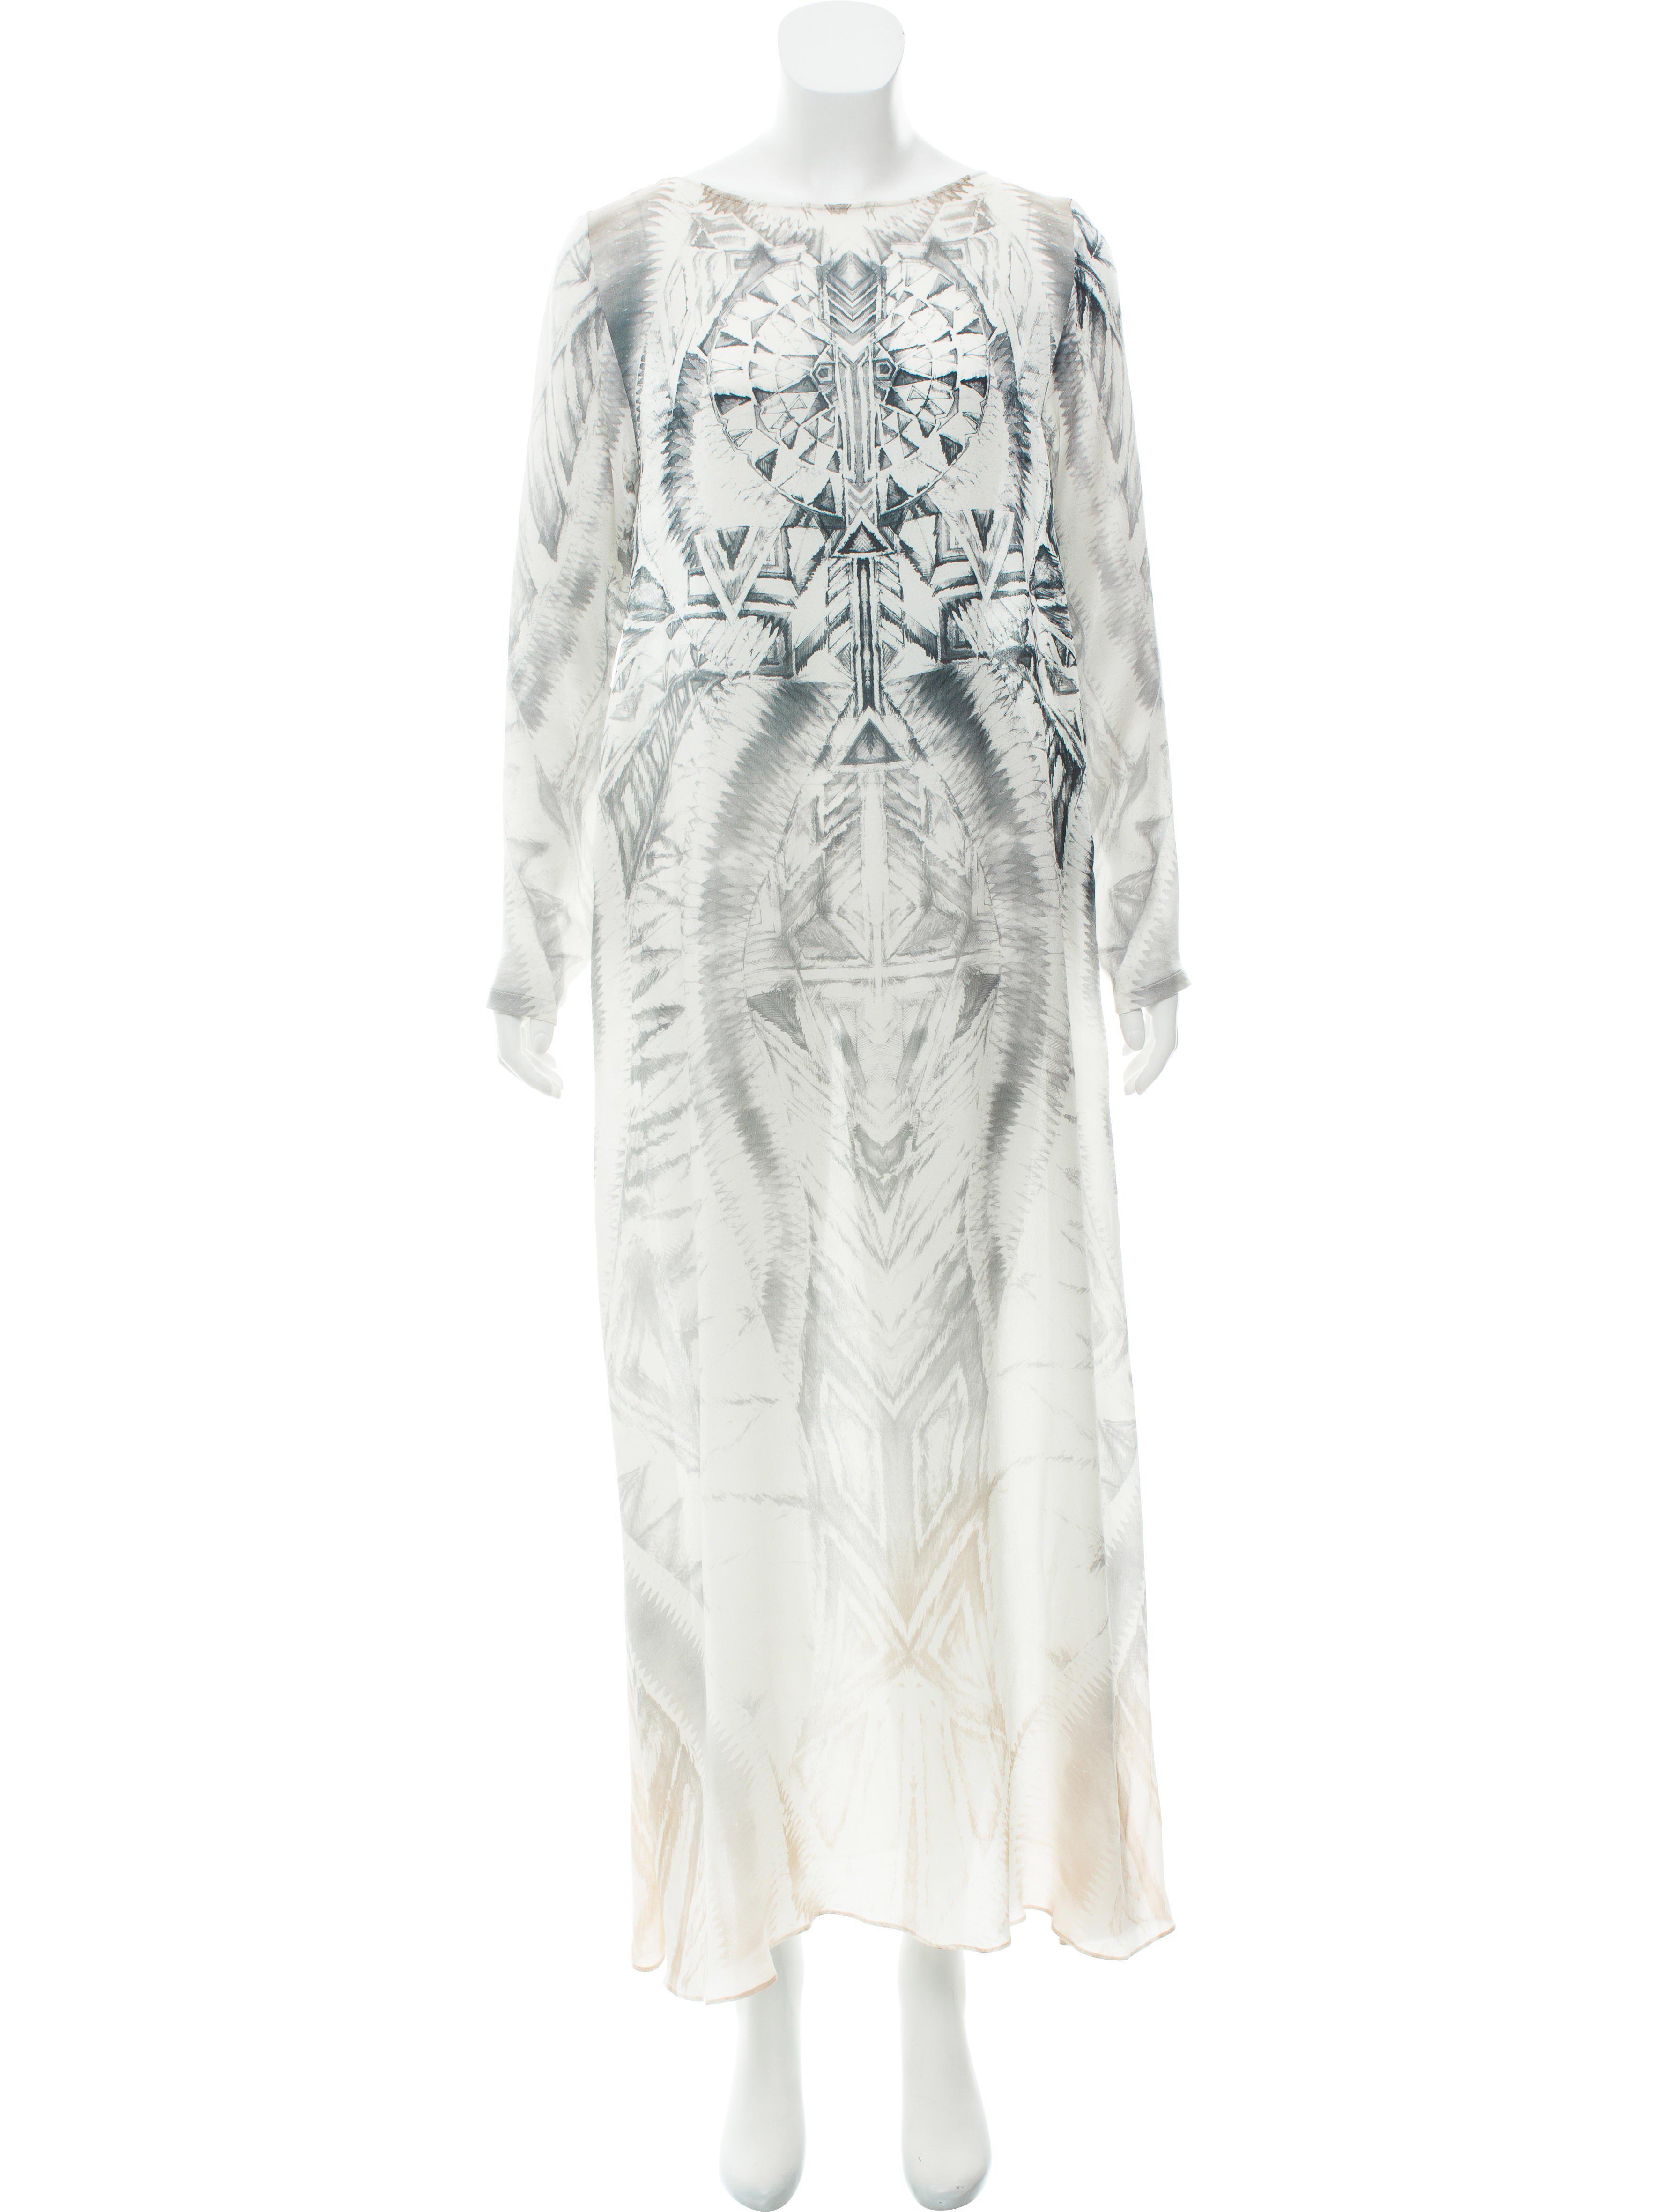 69563ce1 Lyst - Balmain Printed Silk Dress Grey in Gray